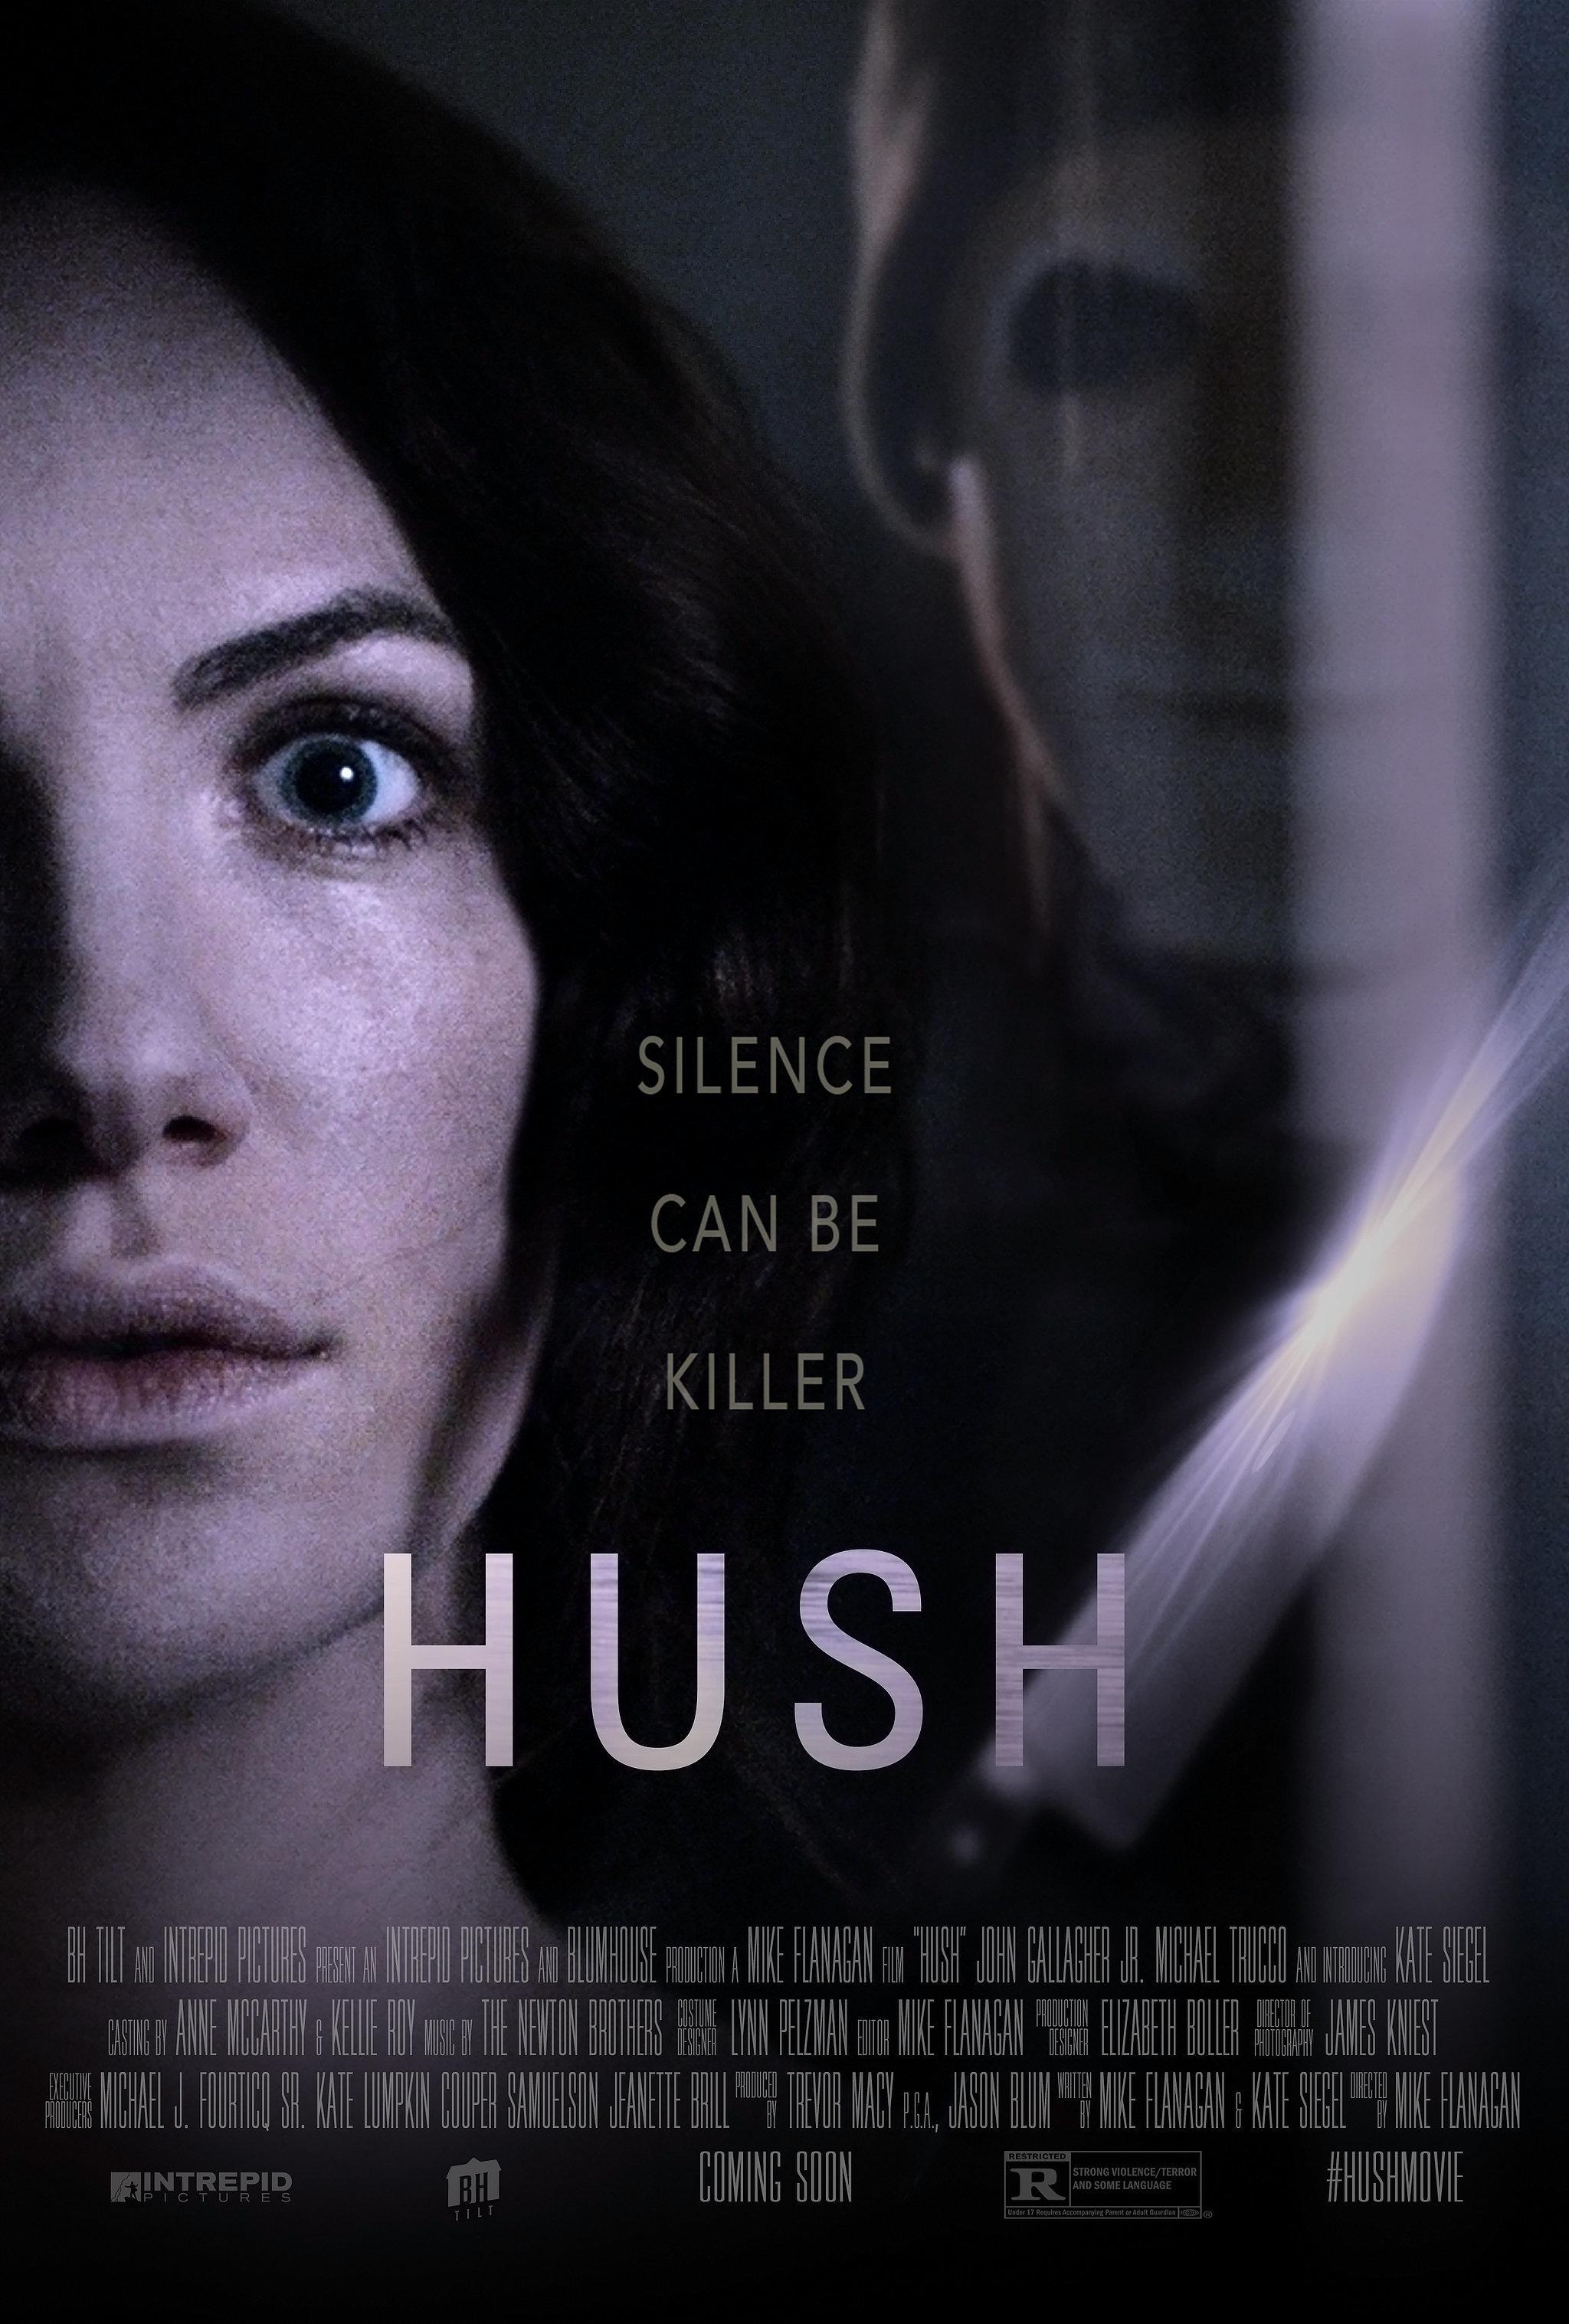 hush-movie-poster-2016.jpg